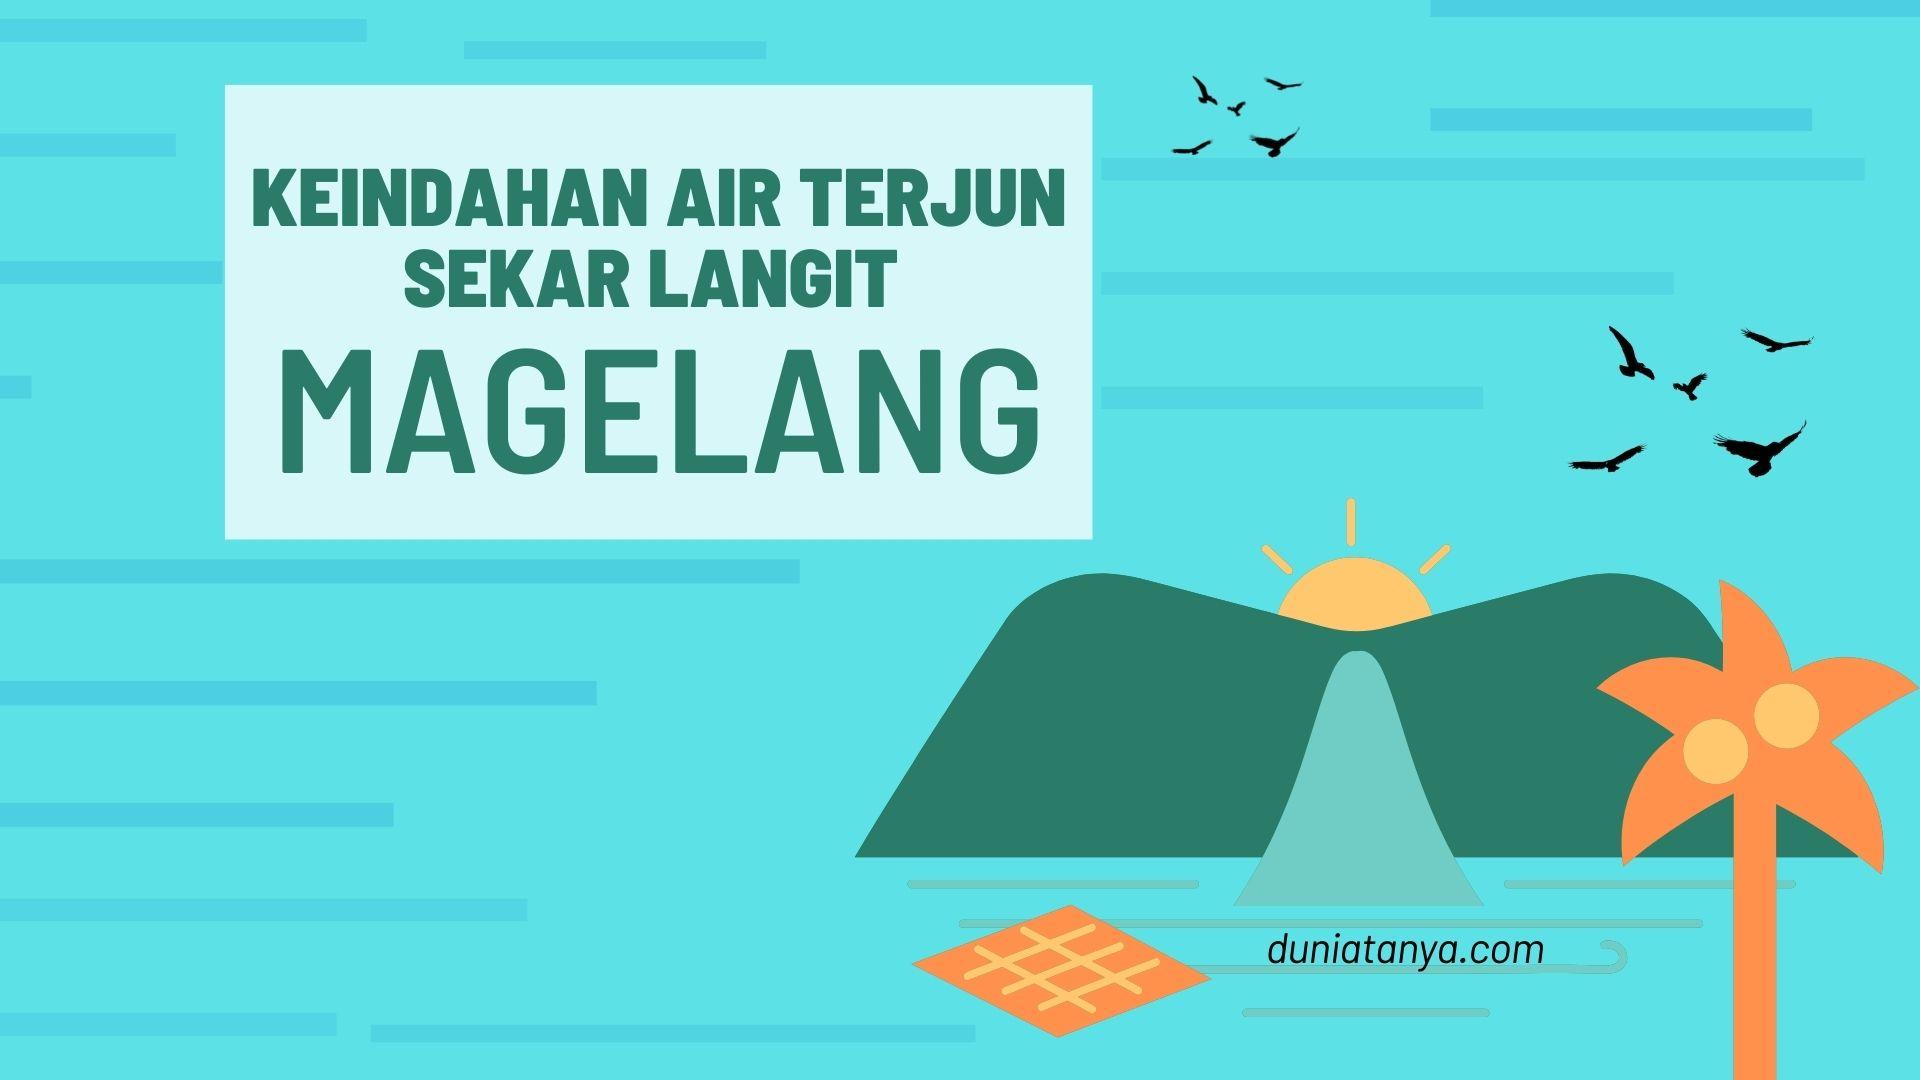 Read more about the article Keindahan Air Terjun Sekar Langit Magelang